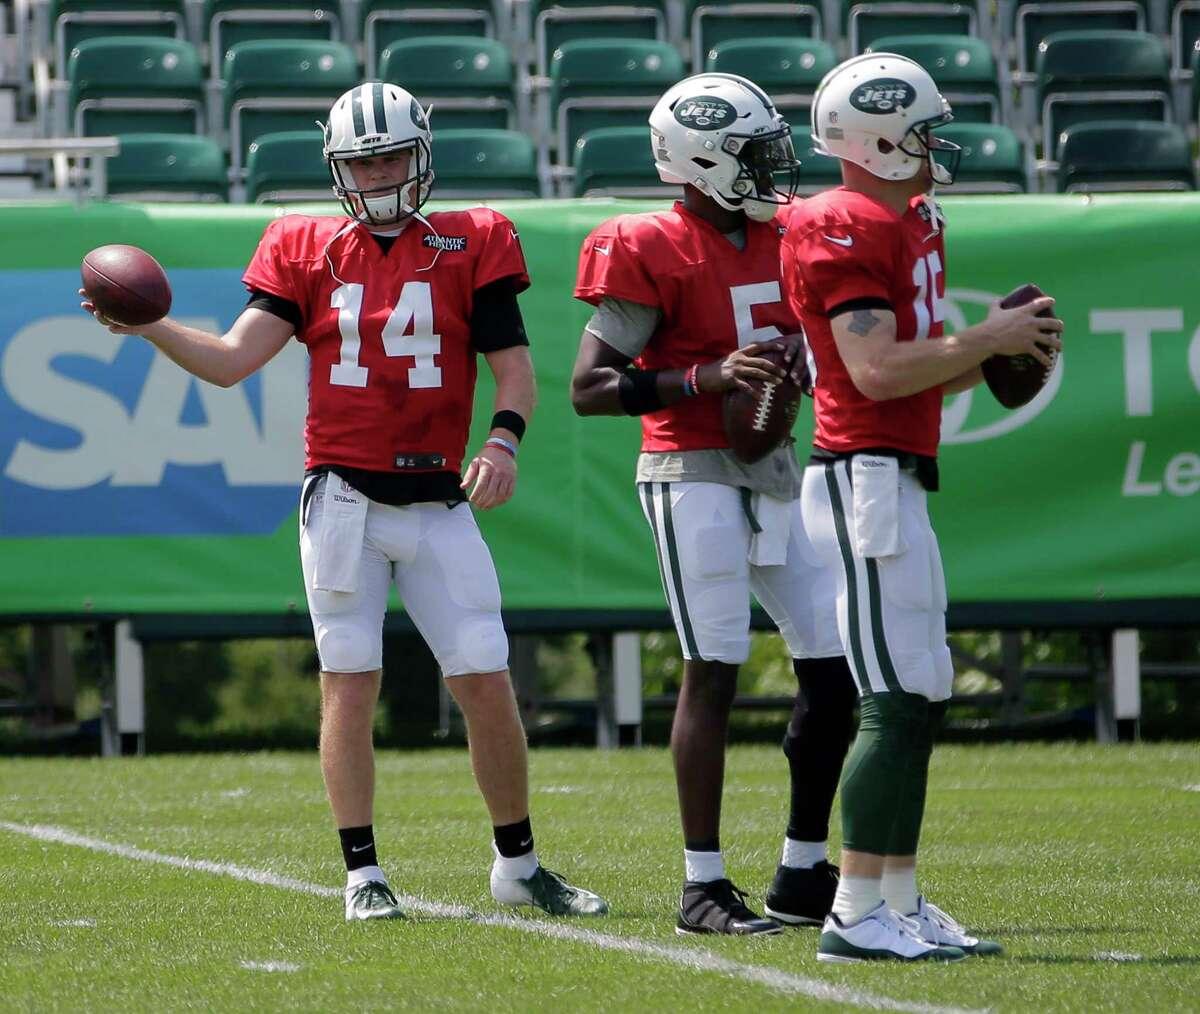 New York Jets quarterbacks Sam Darnold, left, Teddy Bridgewater, center, and Josh McCown participate during practice at the NFL football team's training camp in Florham Park, N.J., Monday, Aug. 6, 2018. (AP Photo/Seth Wenig)